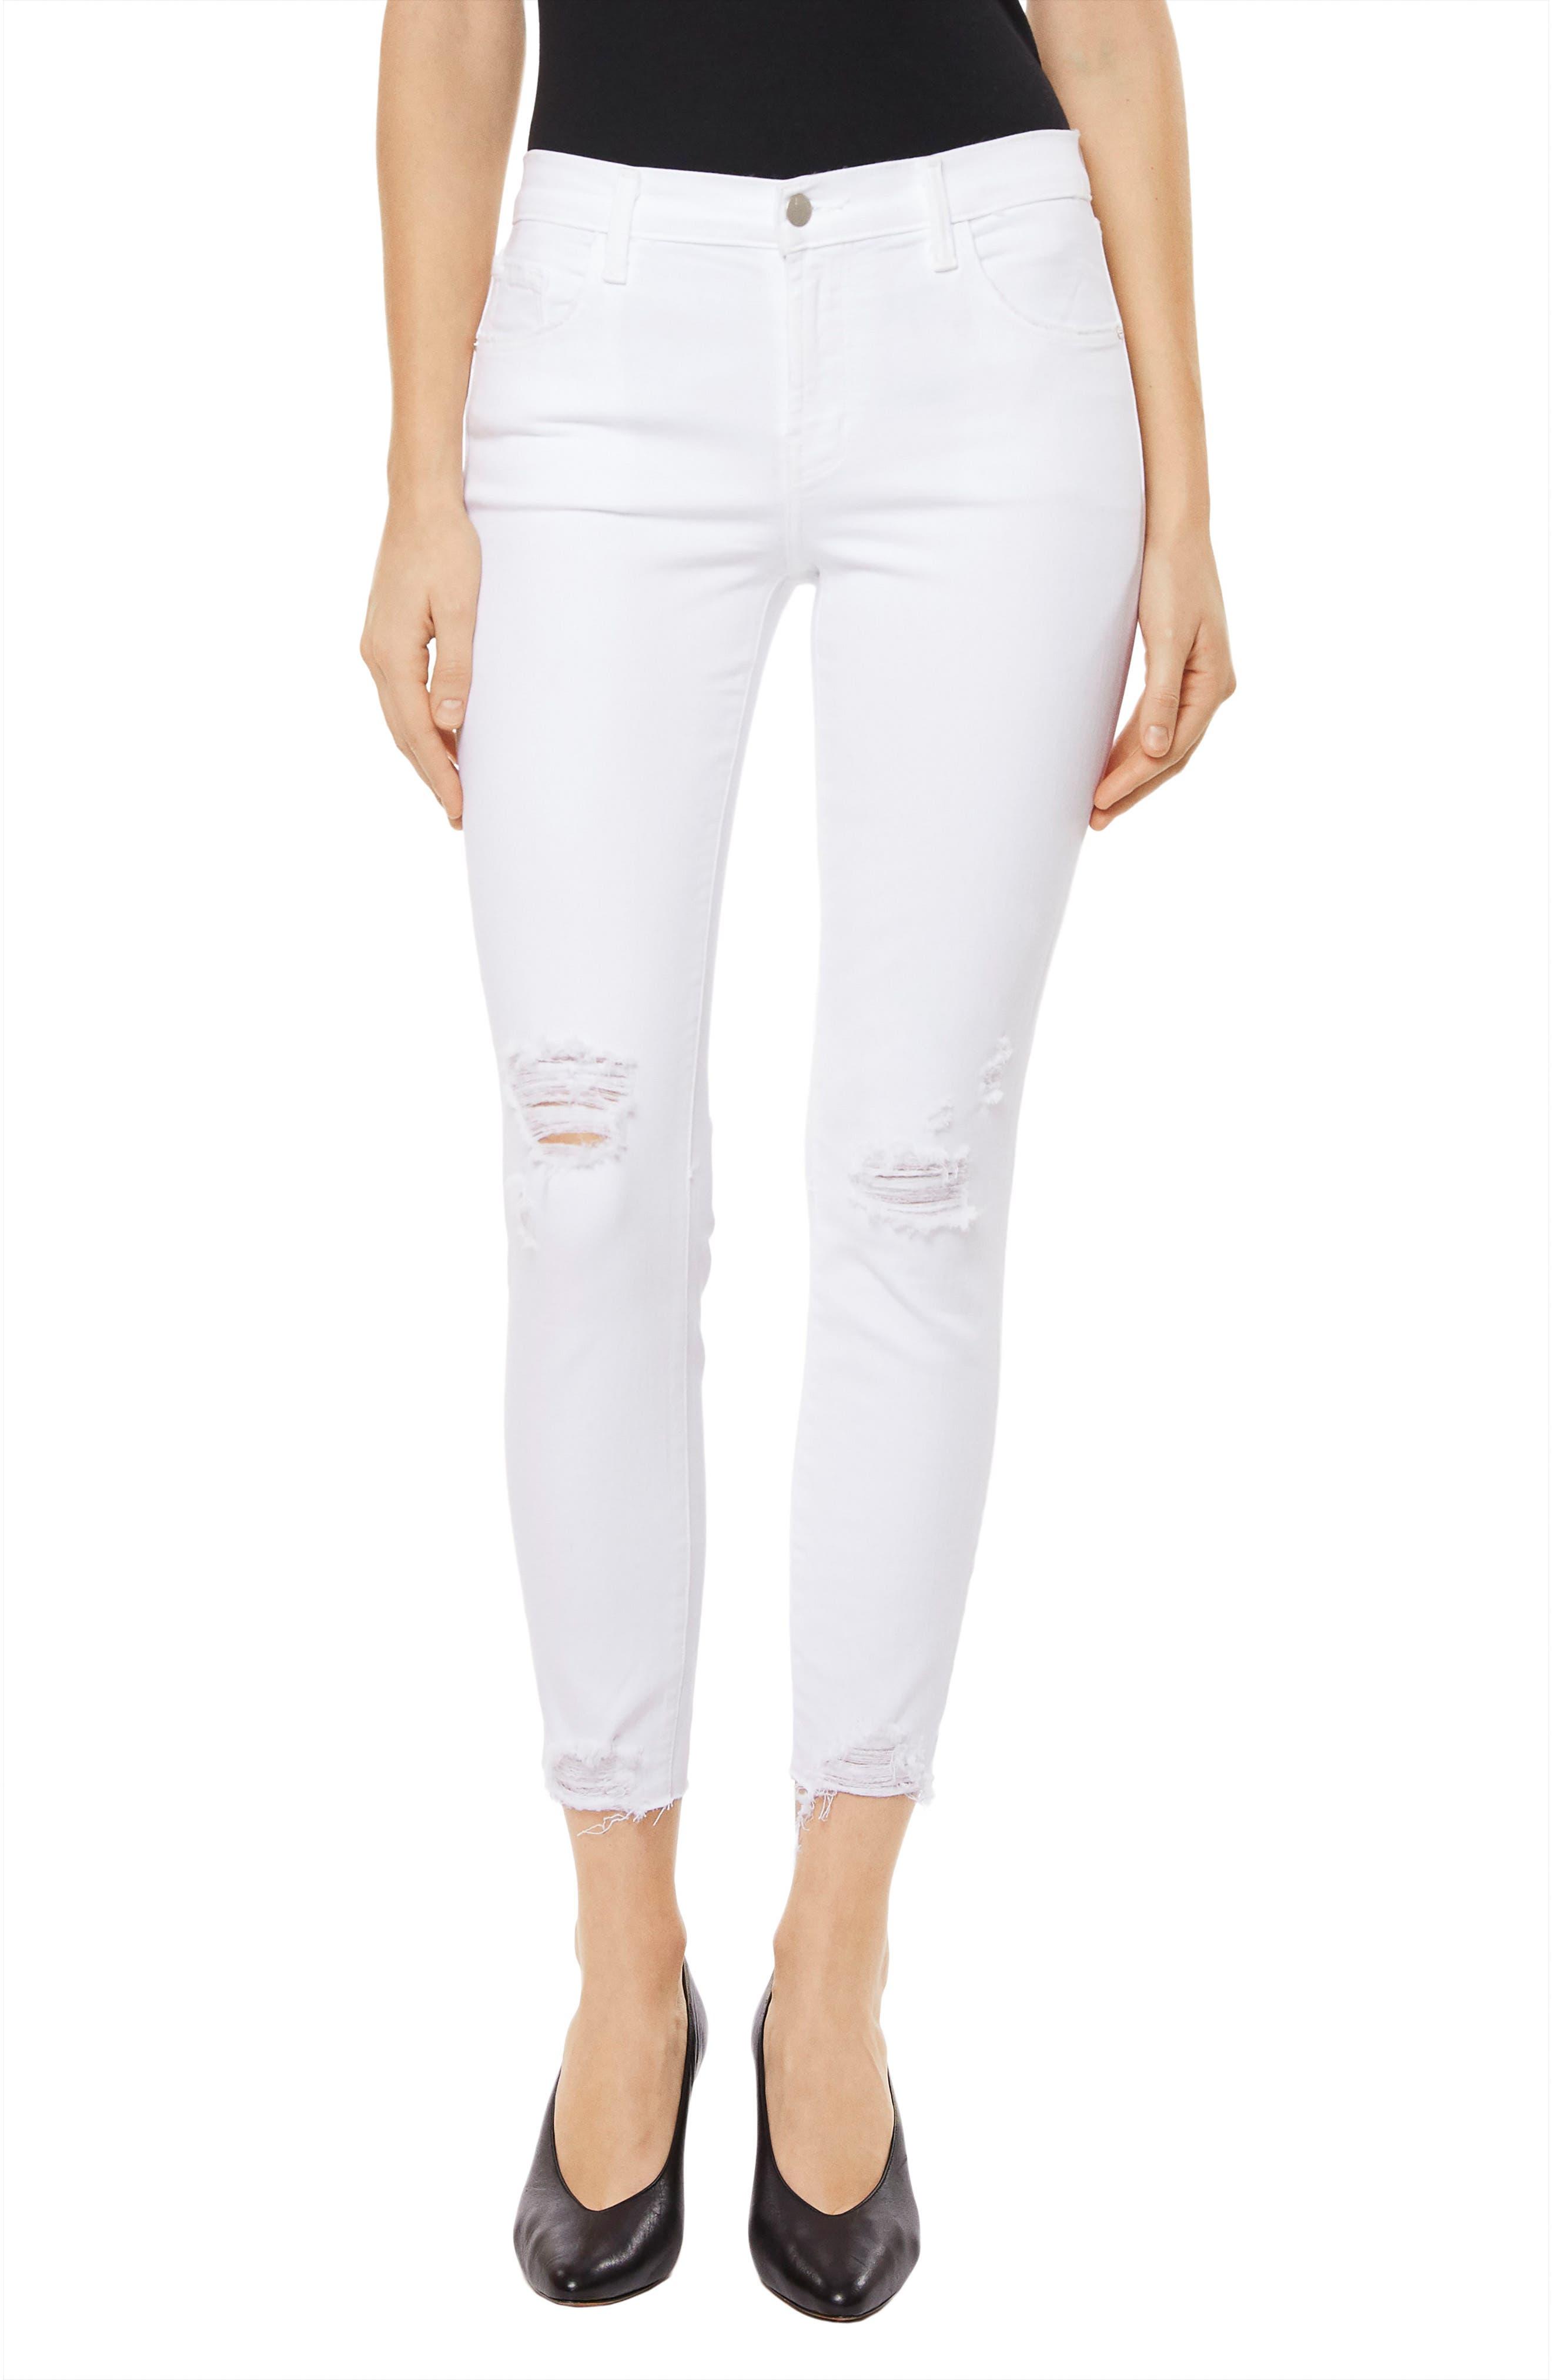 835 Capri Skinny Jeans,                             Main thumbnail 1, color,                             Underexposed